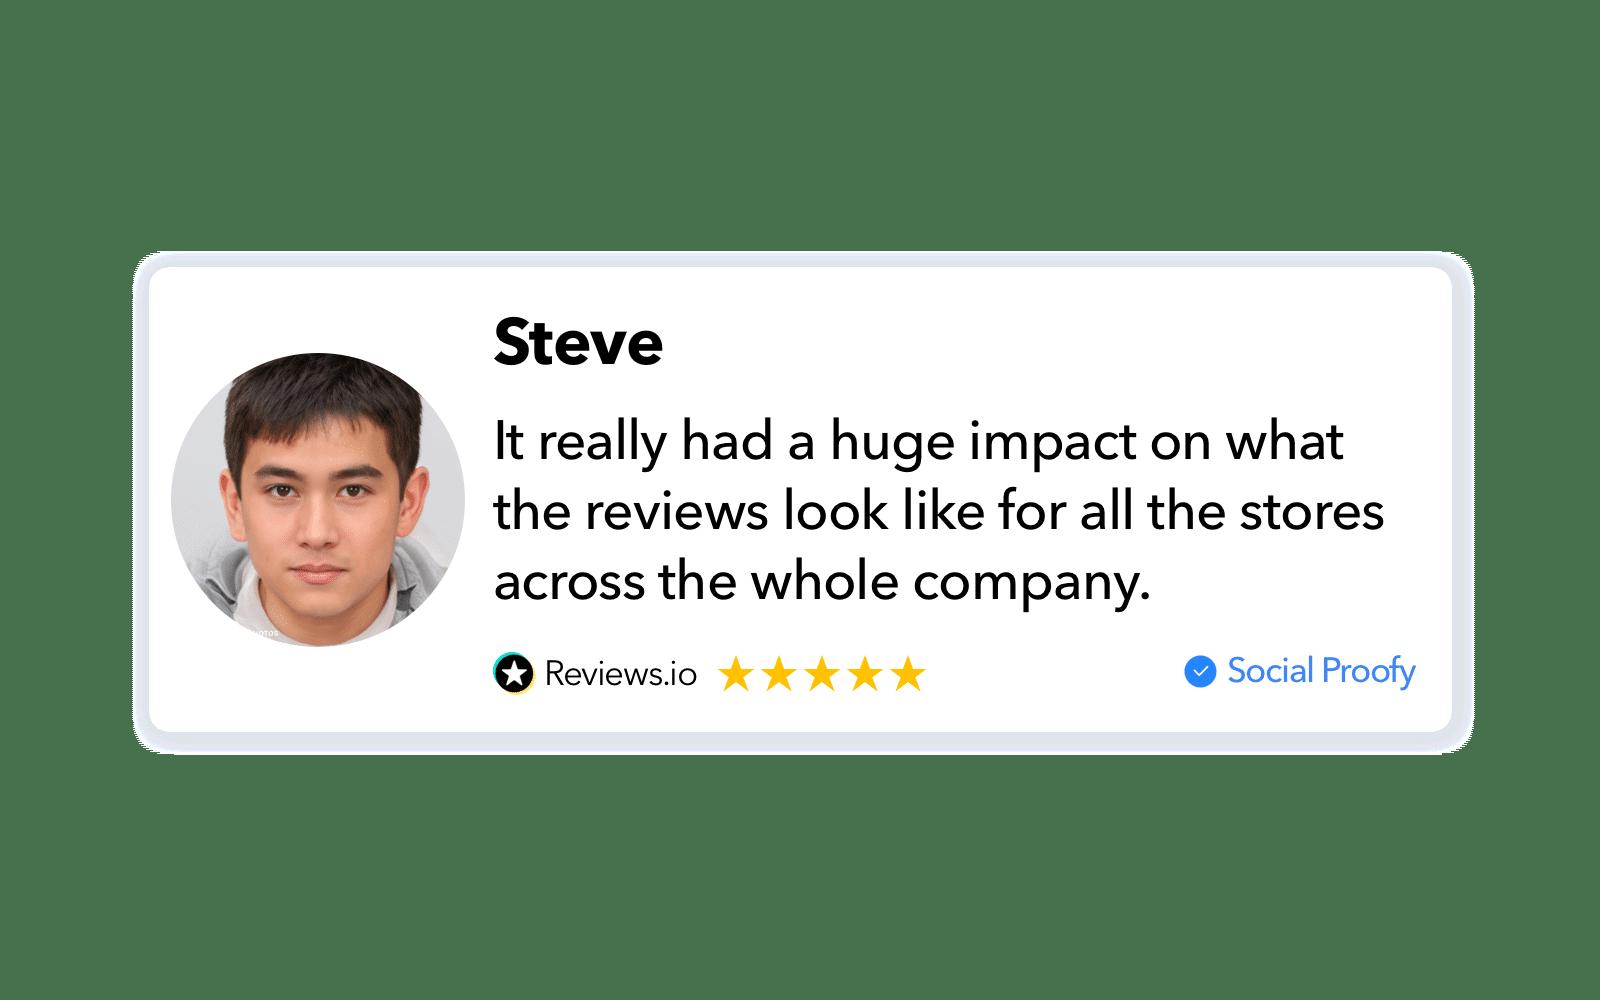 Review.io Review Widget